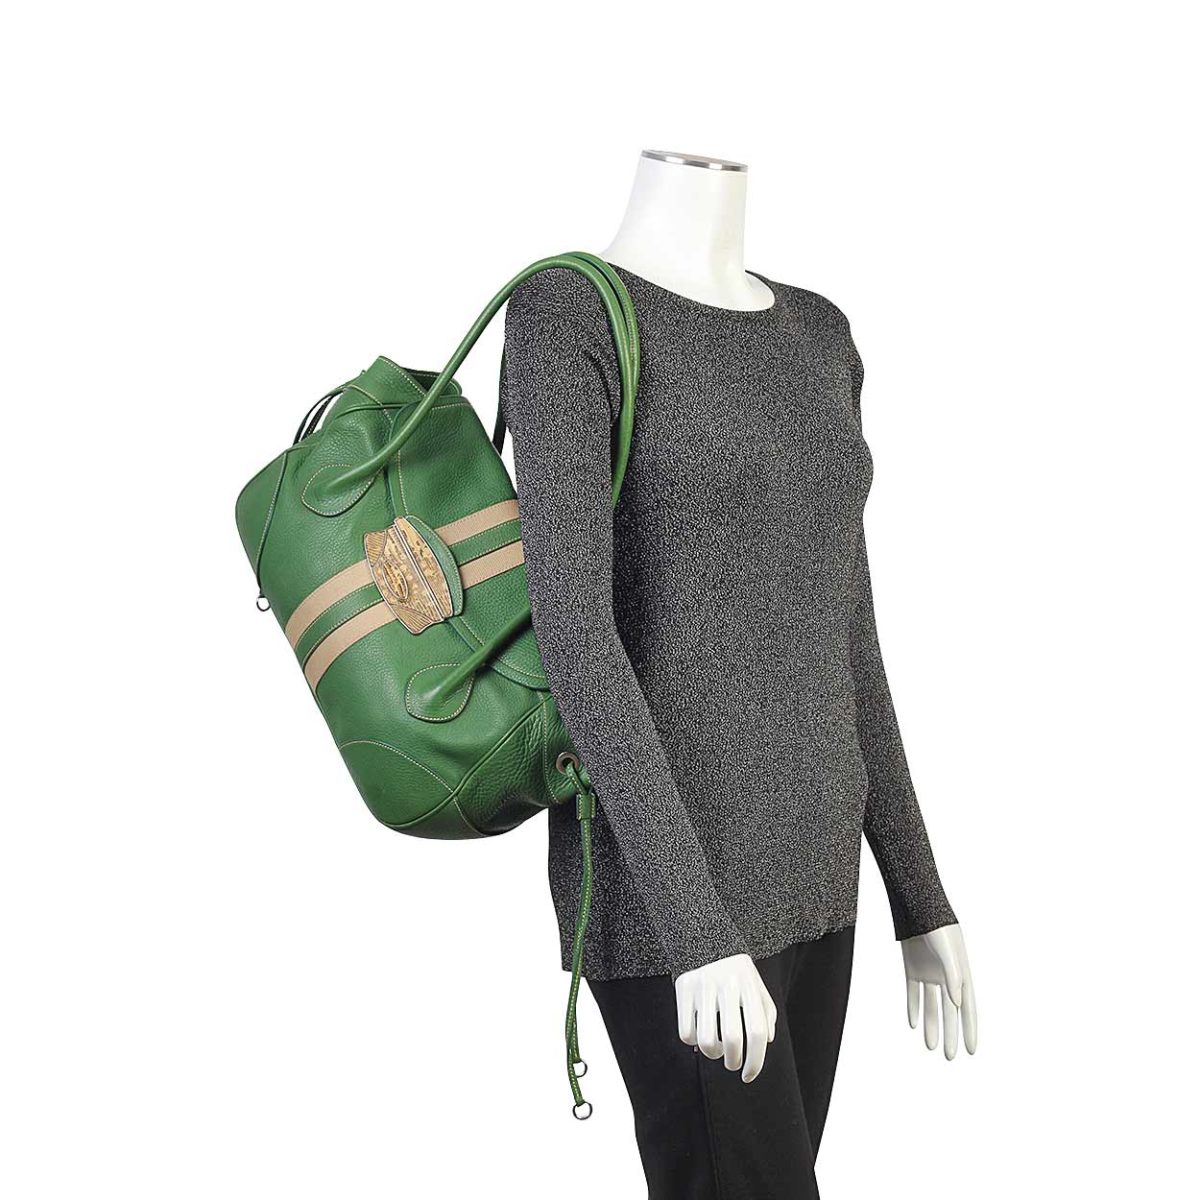 e38fe3d9e22b PRADA Leather Python Embellished Buckle Shoulder Bag Green | Luxity